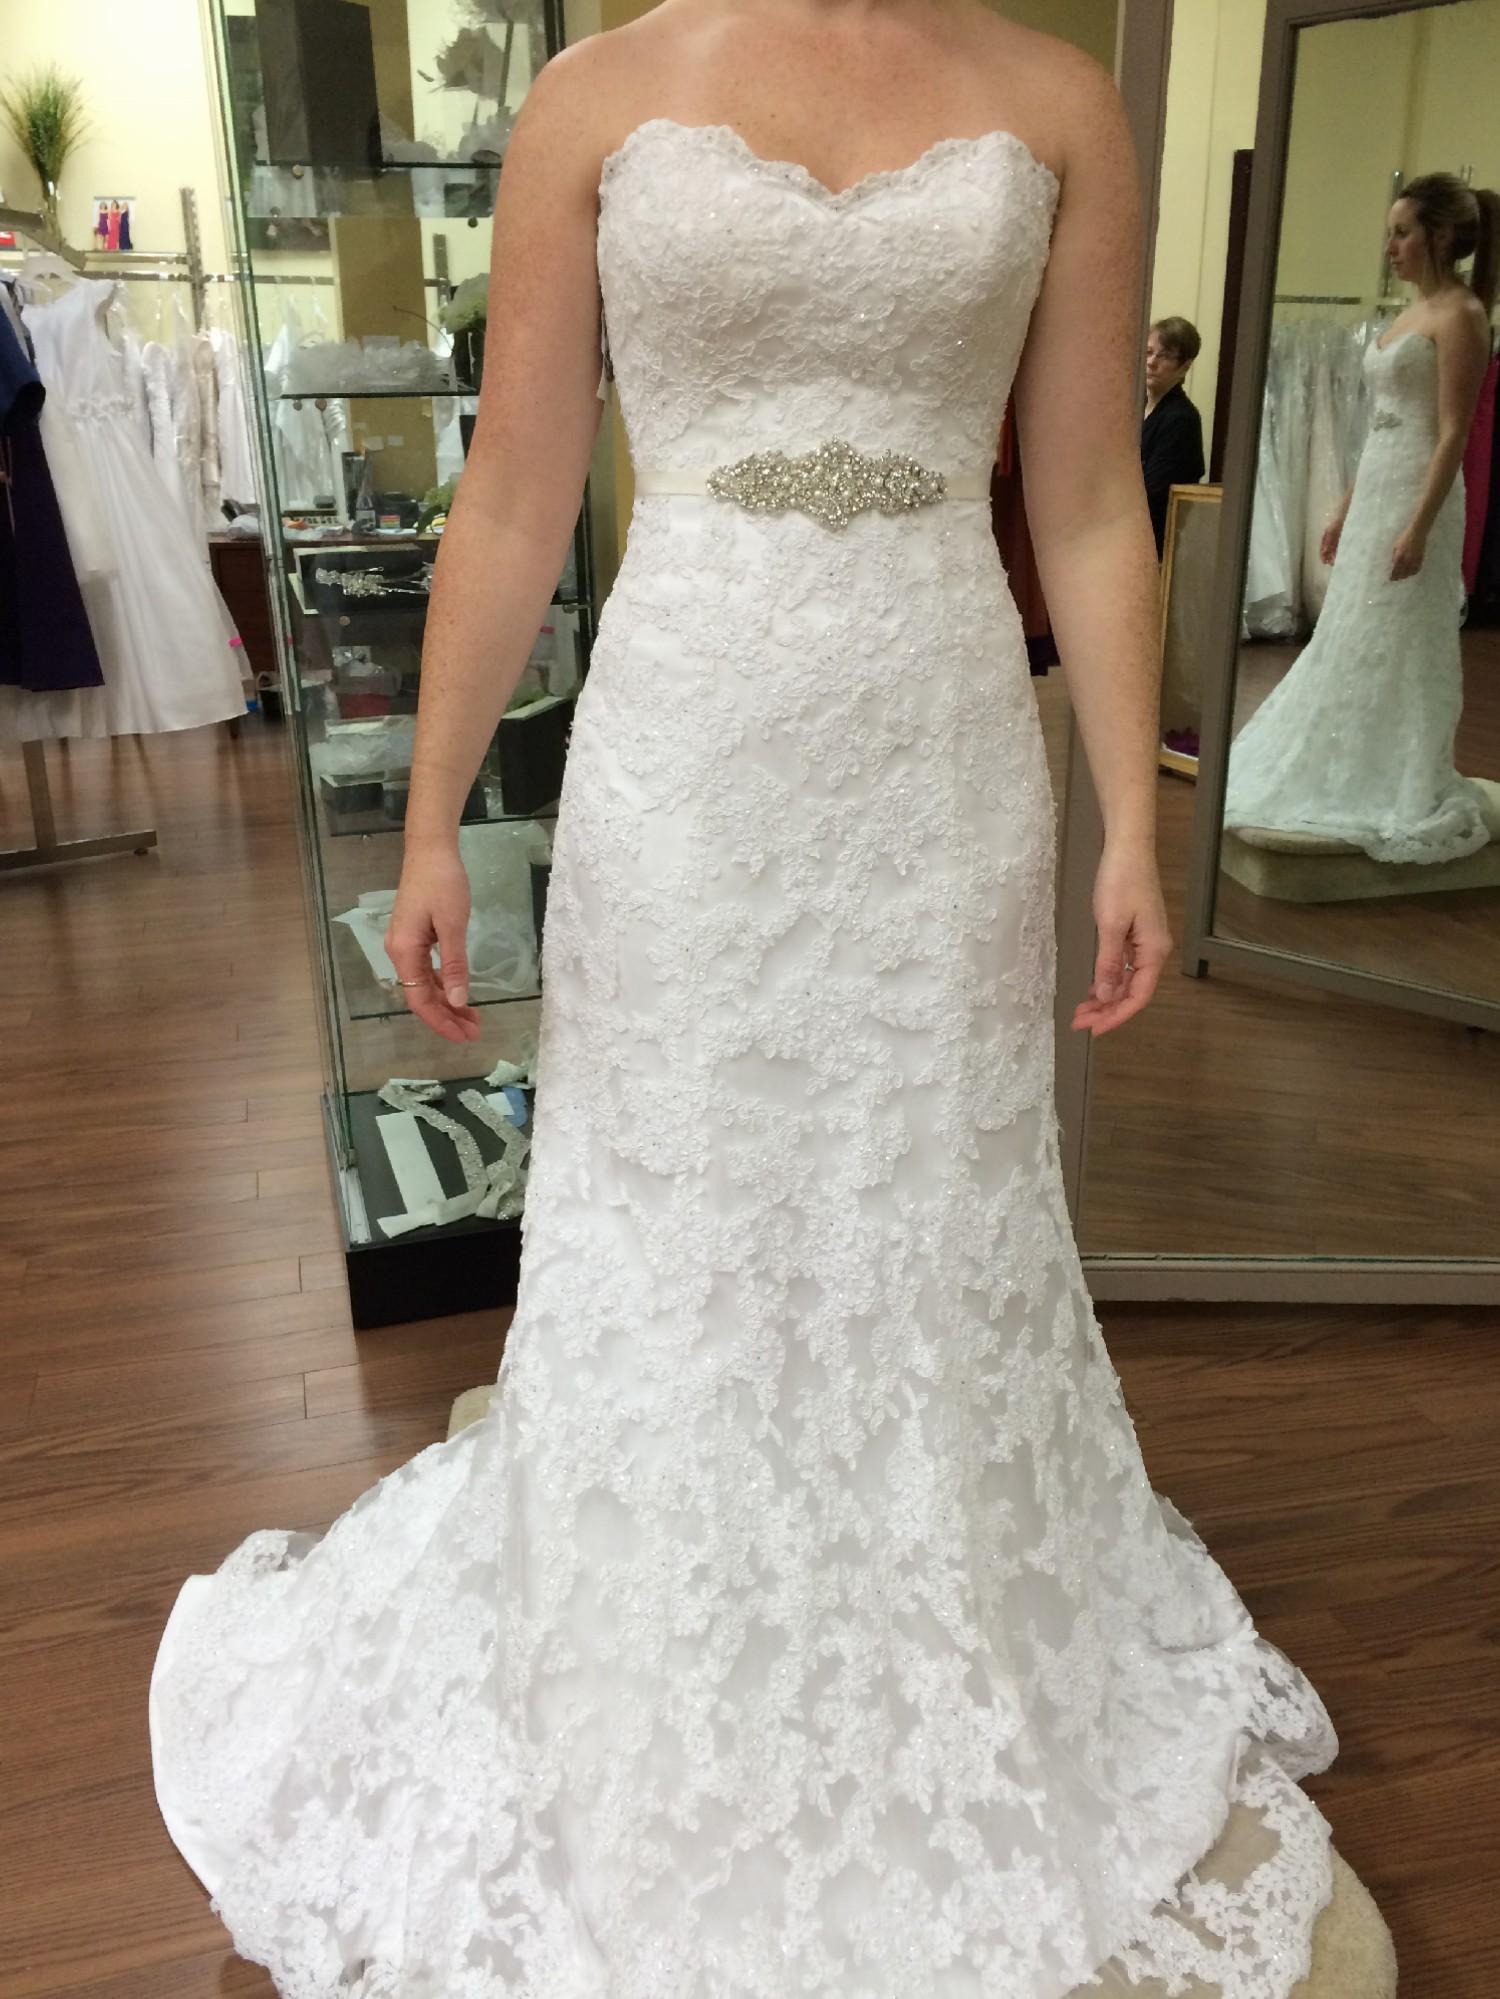 Wedding Dress Alterations Halifax : Line wedding dress on sale off